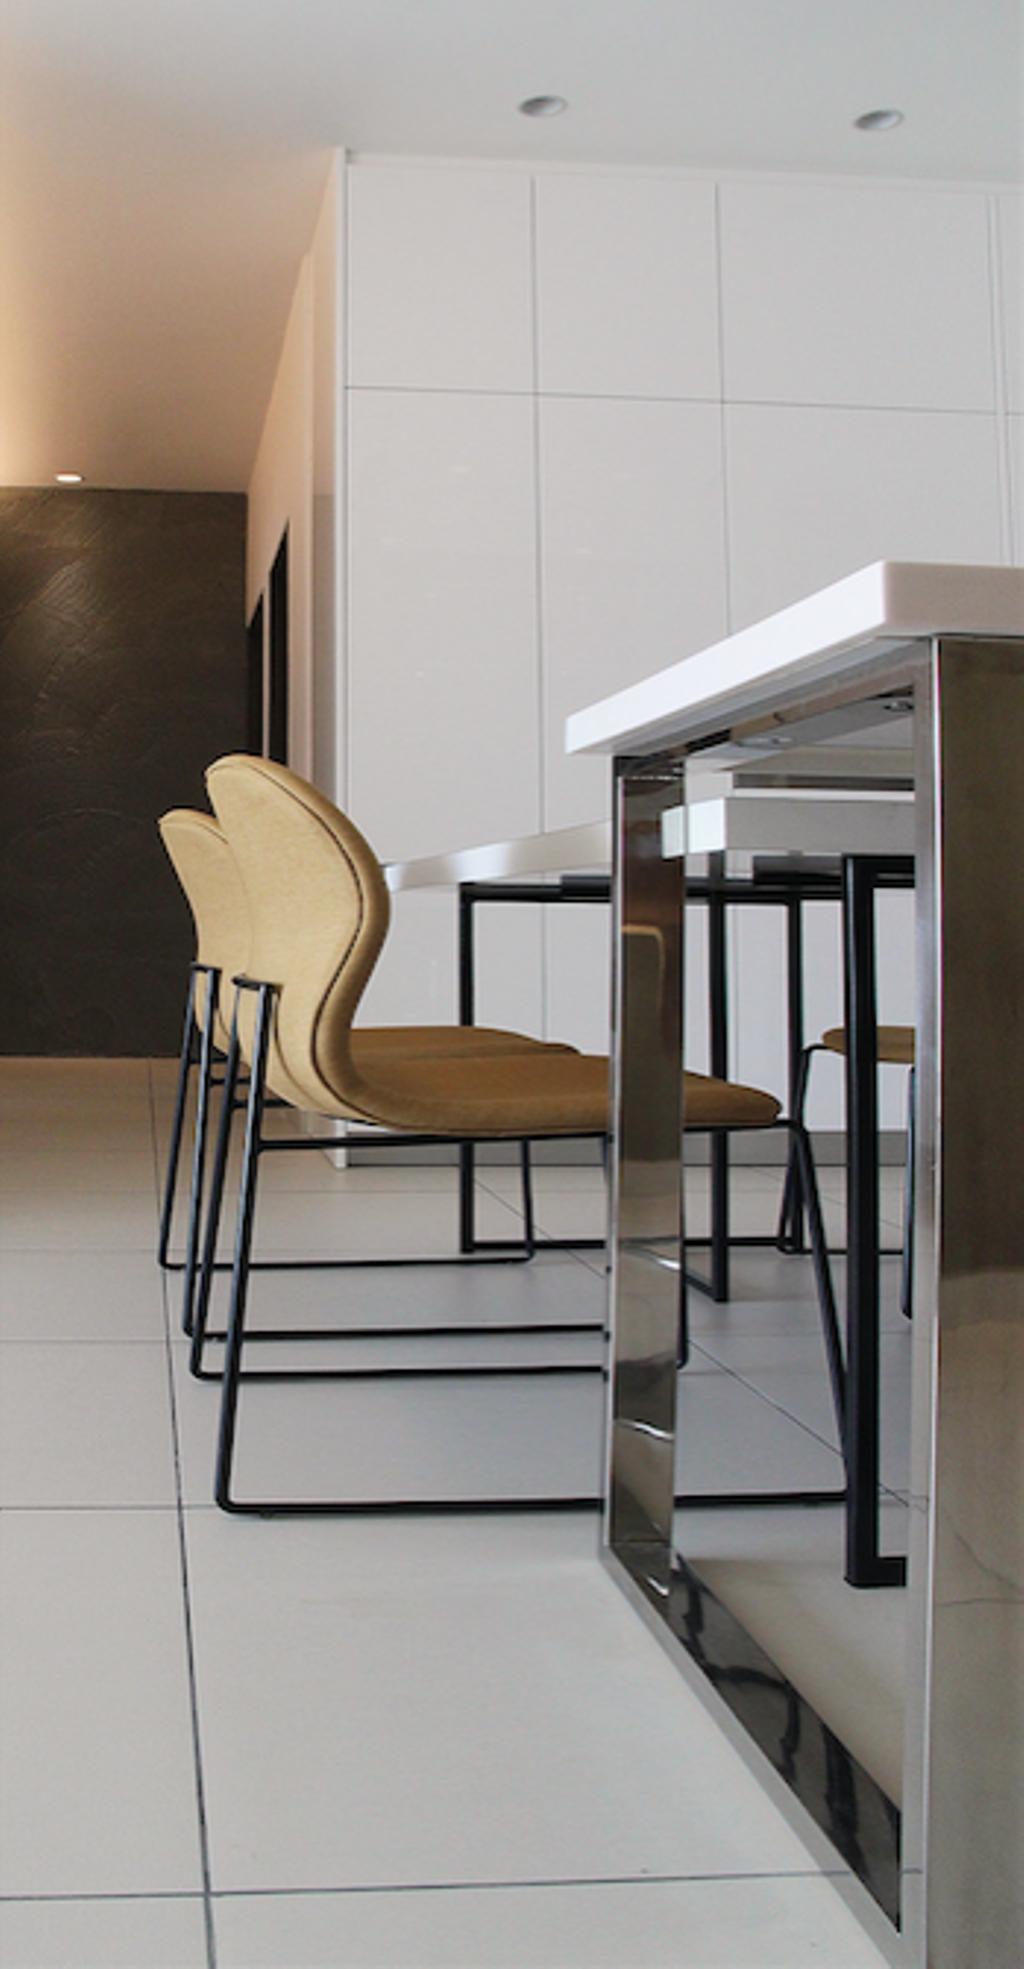 The Quintet @ Cameron Highland, Commercial, Interior Designer, Archiplan Interior Design, Modern, Industrial, Dining Room, Furniture, Dining Table, Table